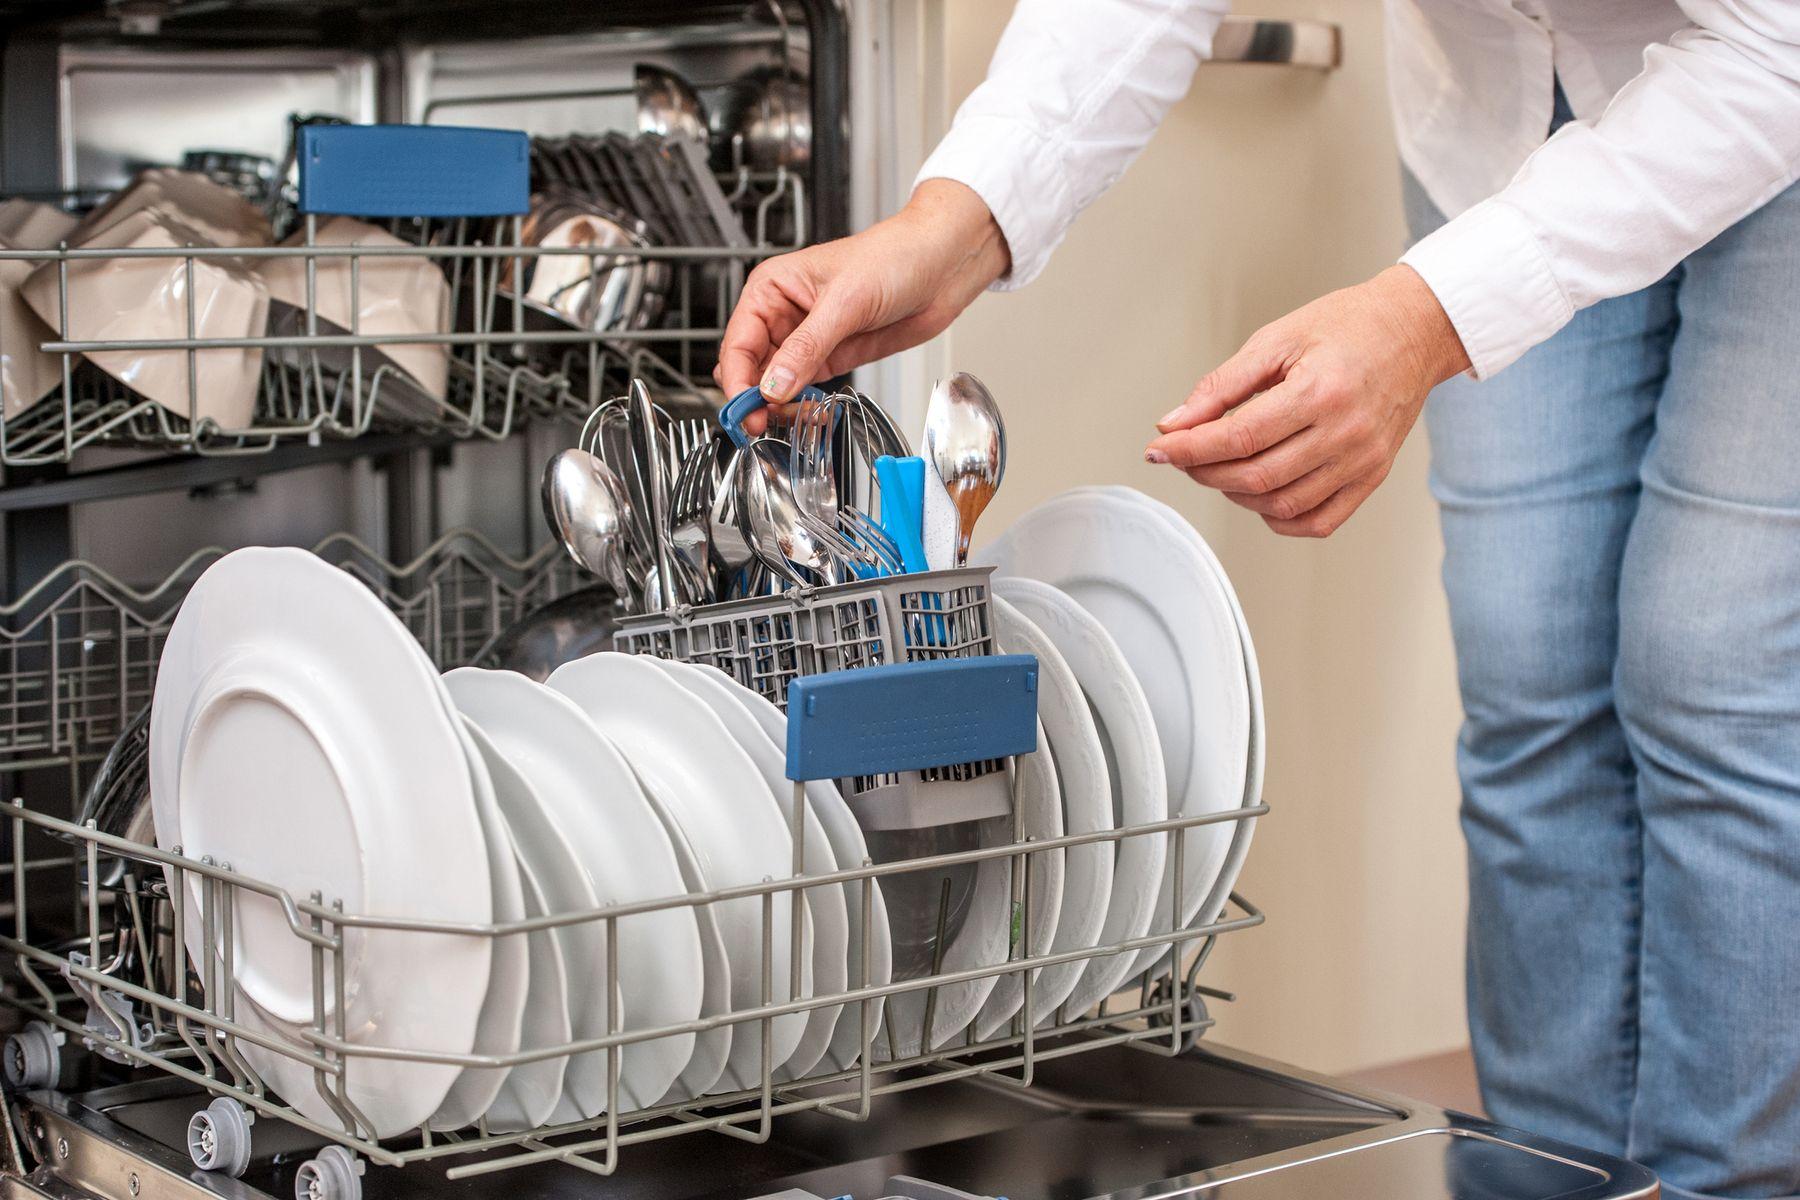 Best dishwasher detergent for spotless dishes